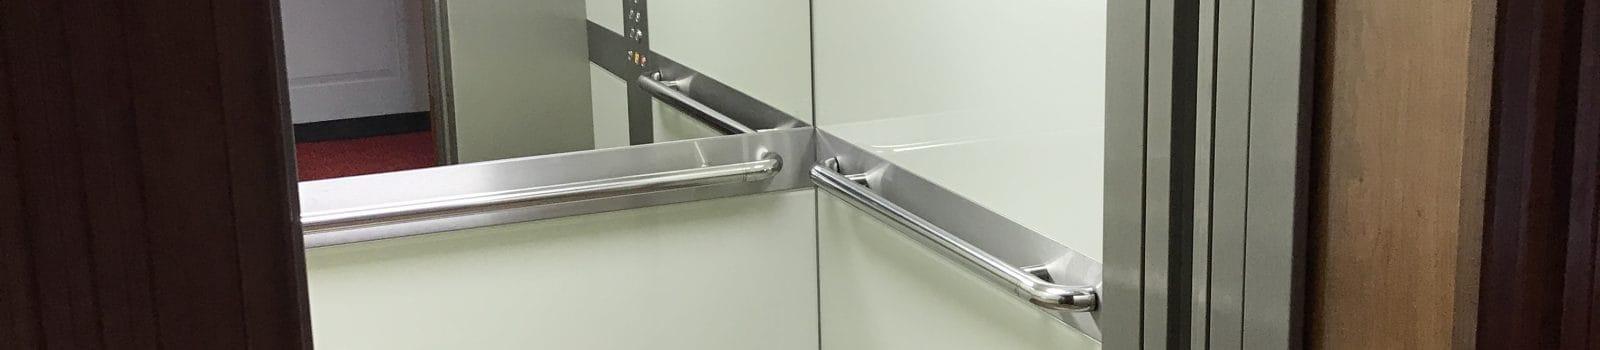 eBay / PayPal lift installation, Richmond